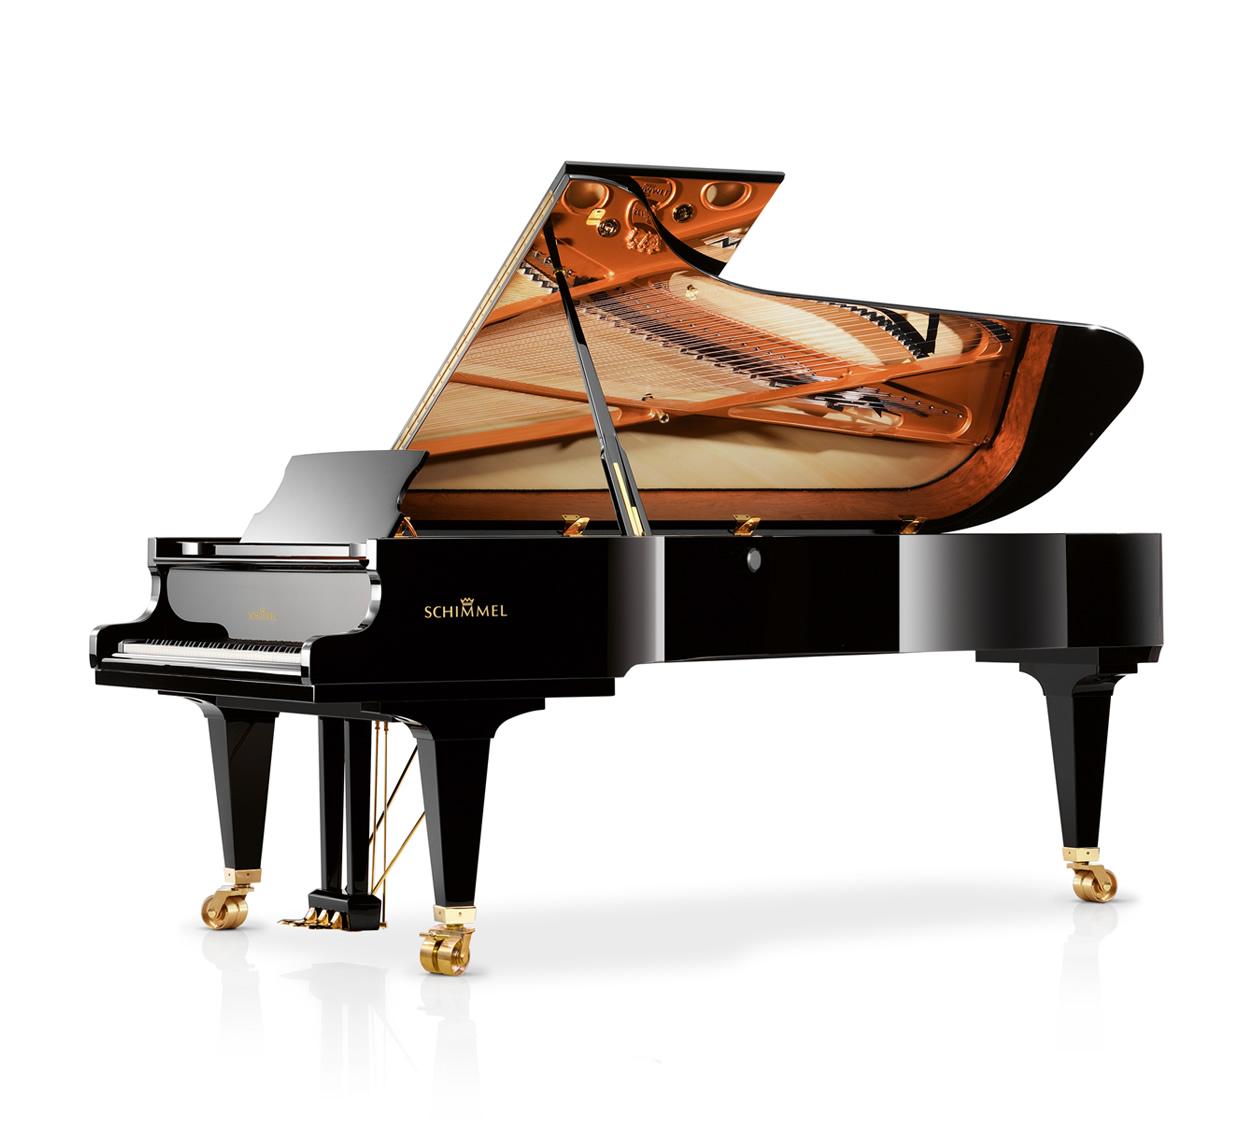 Main Gallery Image: Schimmel Konzert piano models.